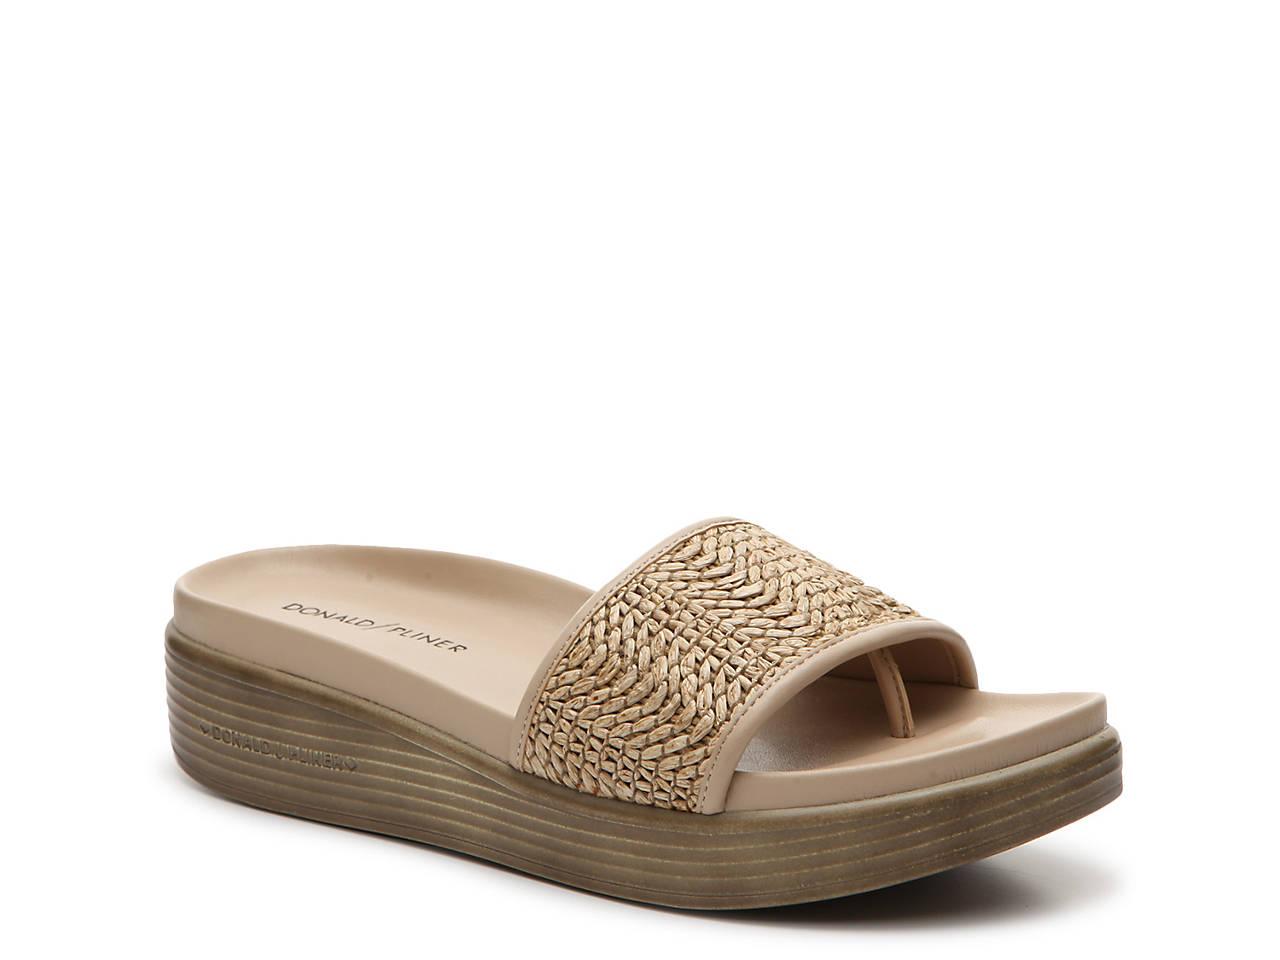 a1c7b306a9a Donald Pliner Fiji Wedge Sandal Women s Shoes